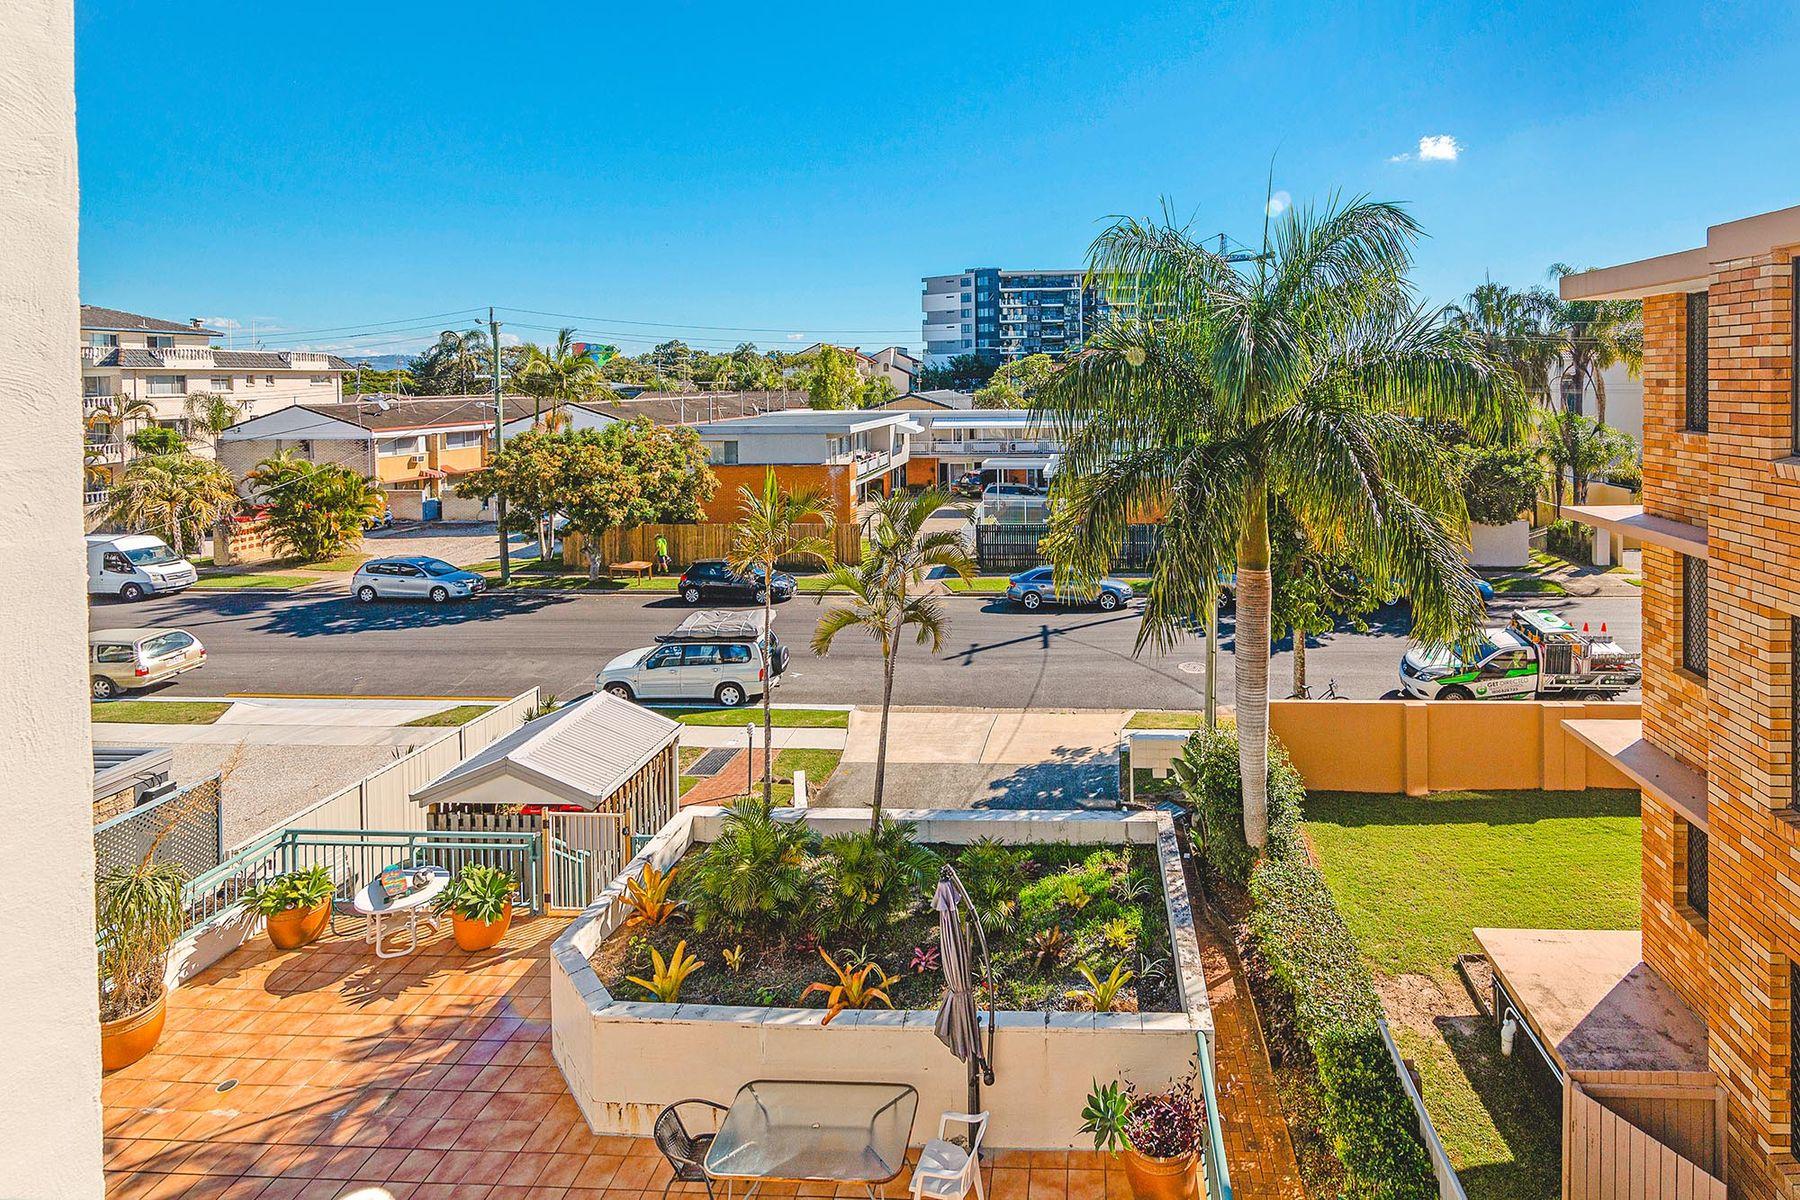 9/9 Stanhill Drive, Chevron Island, QLD 4217